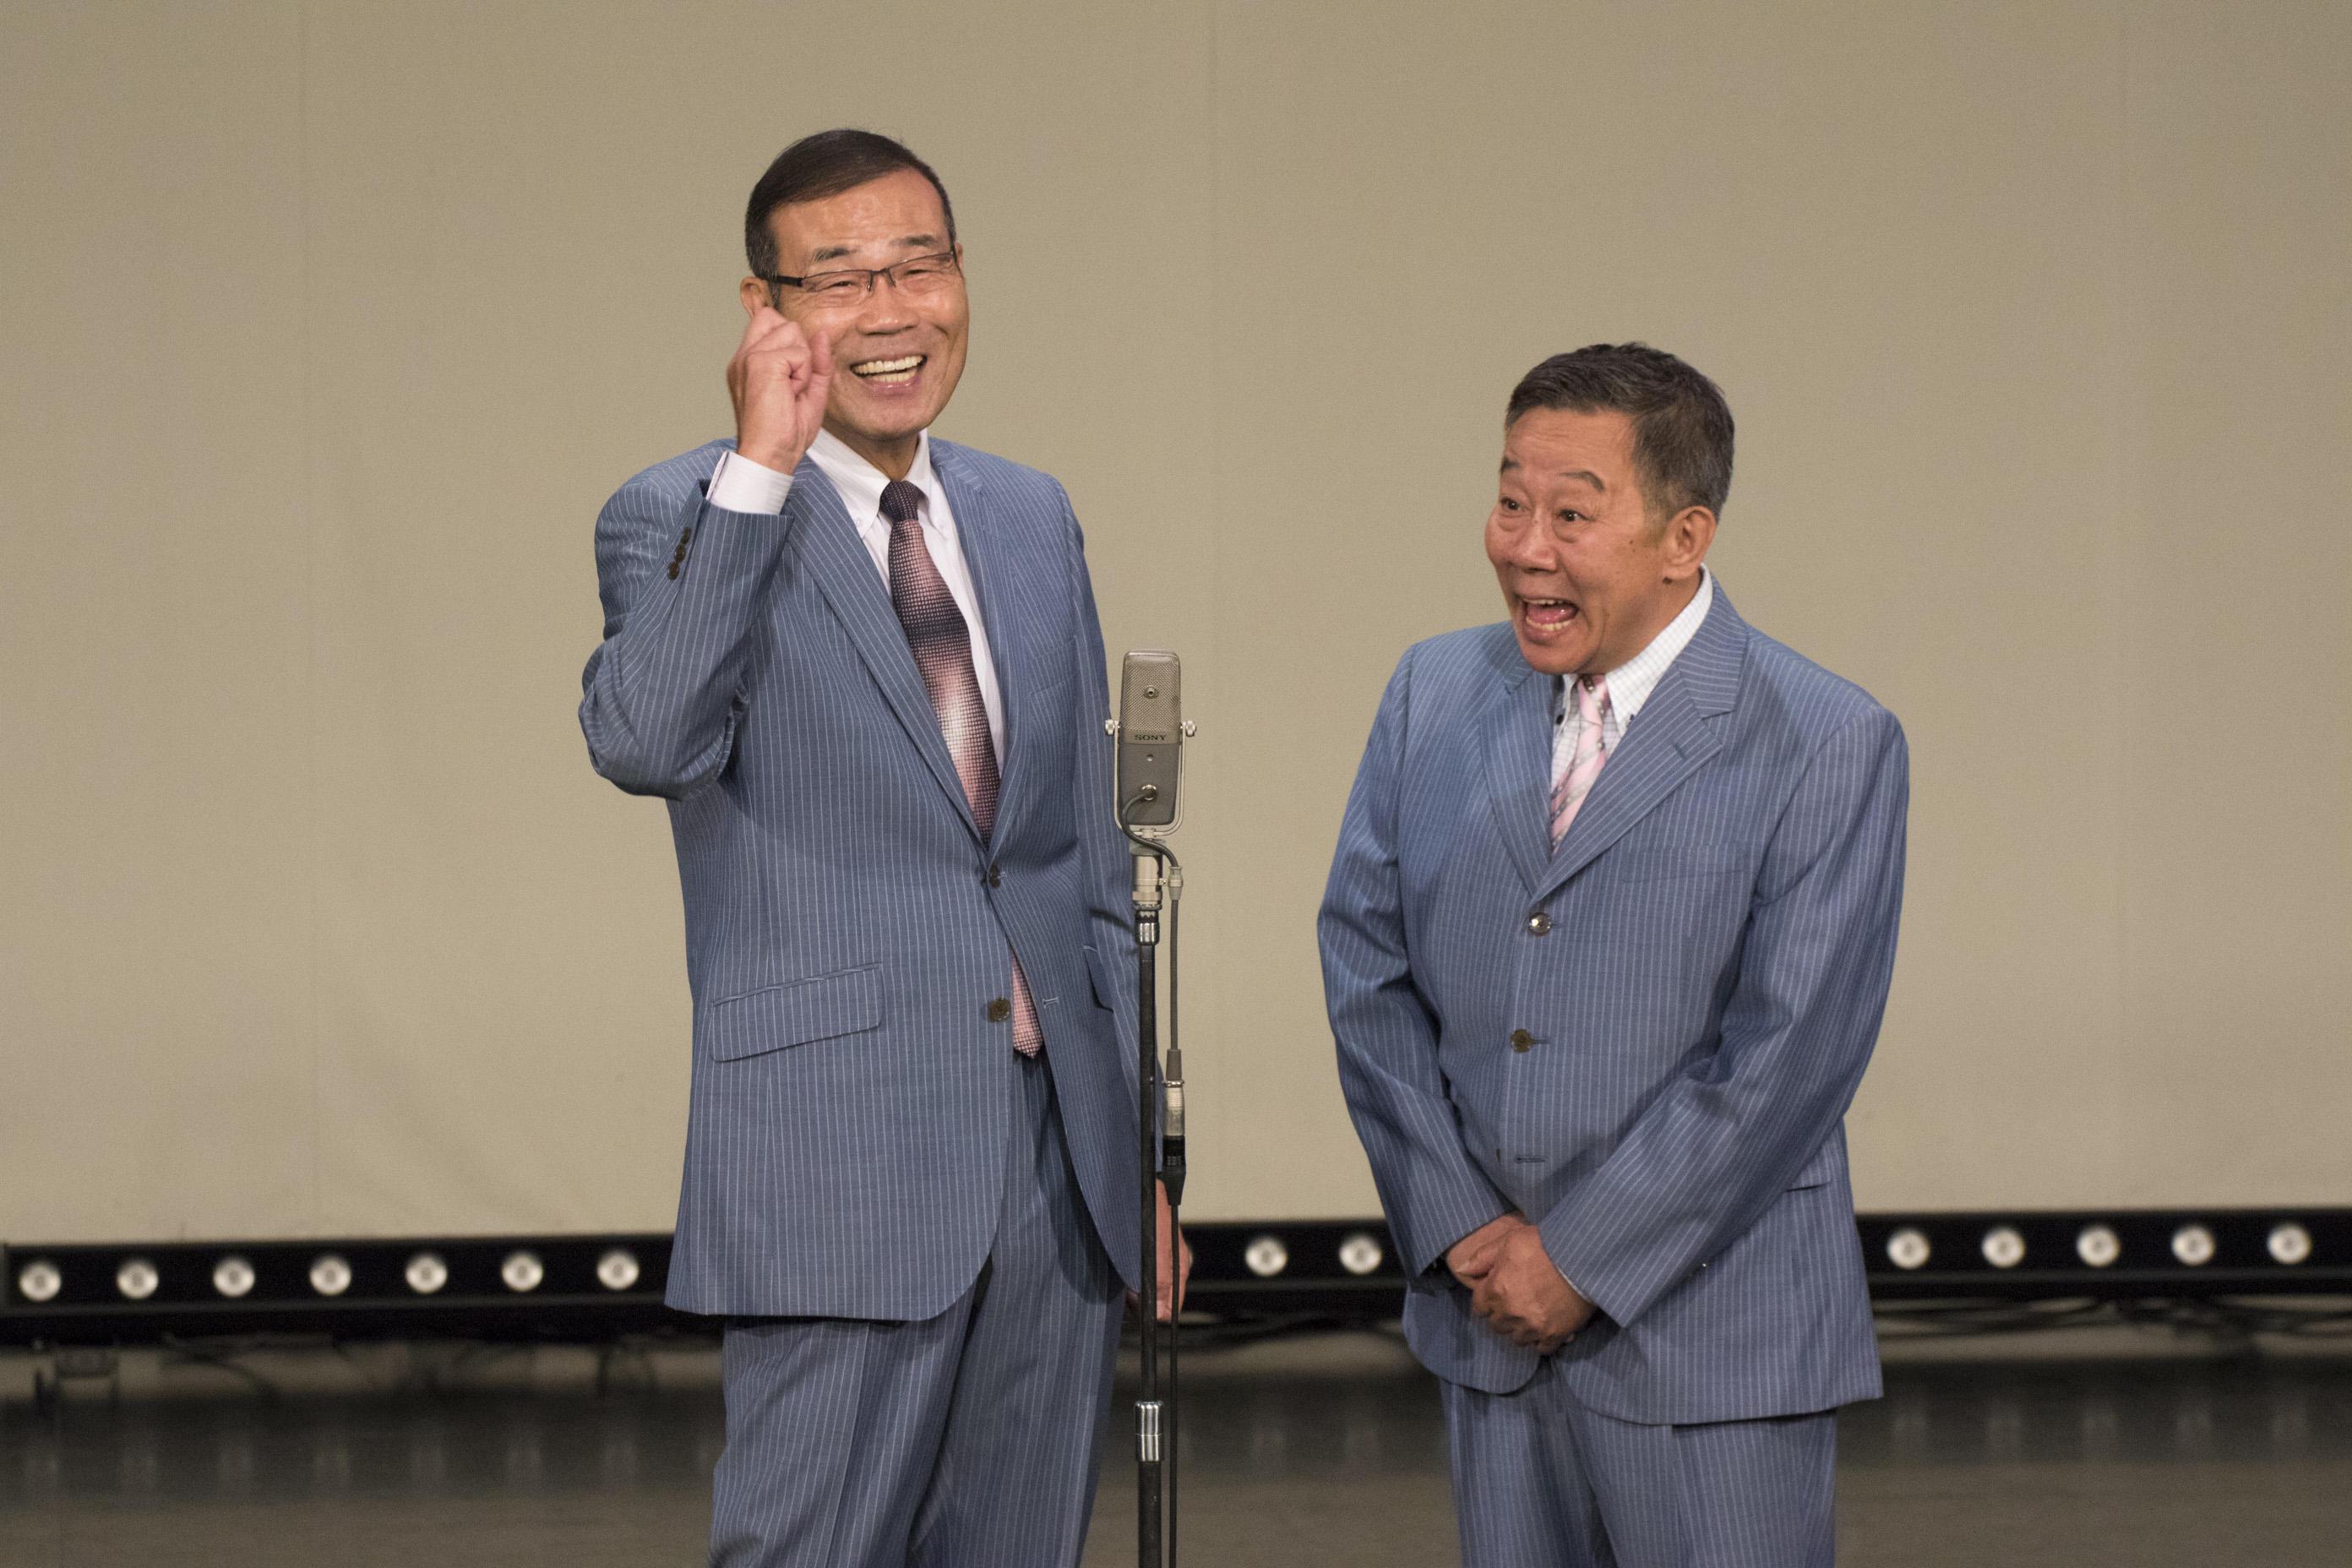 http://news.yoshimoto.co.jp/20170729093024-a1e36ca18cf0c0ee1cadaddd7c12b3924eea5122.jpg